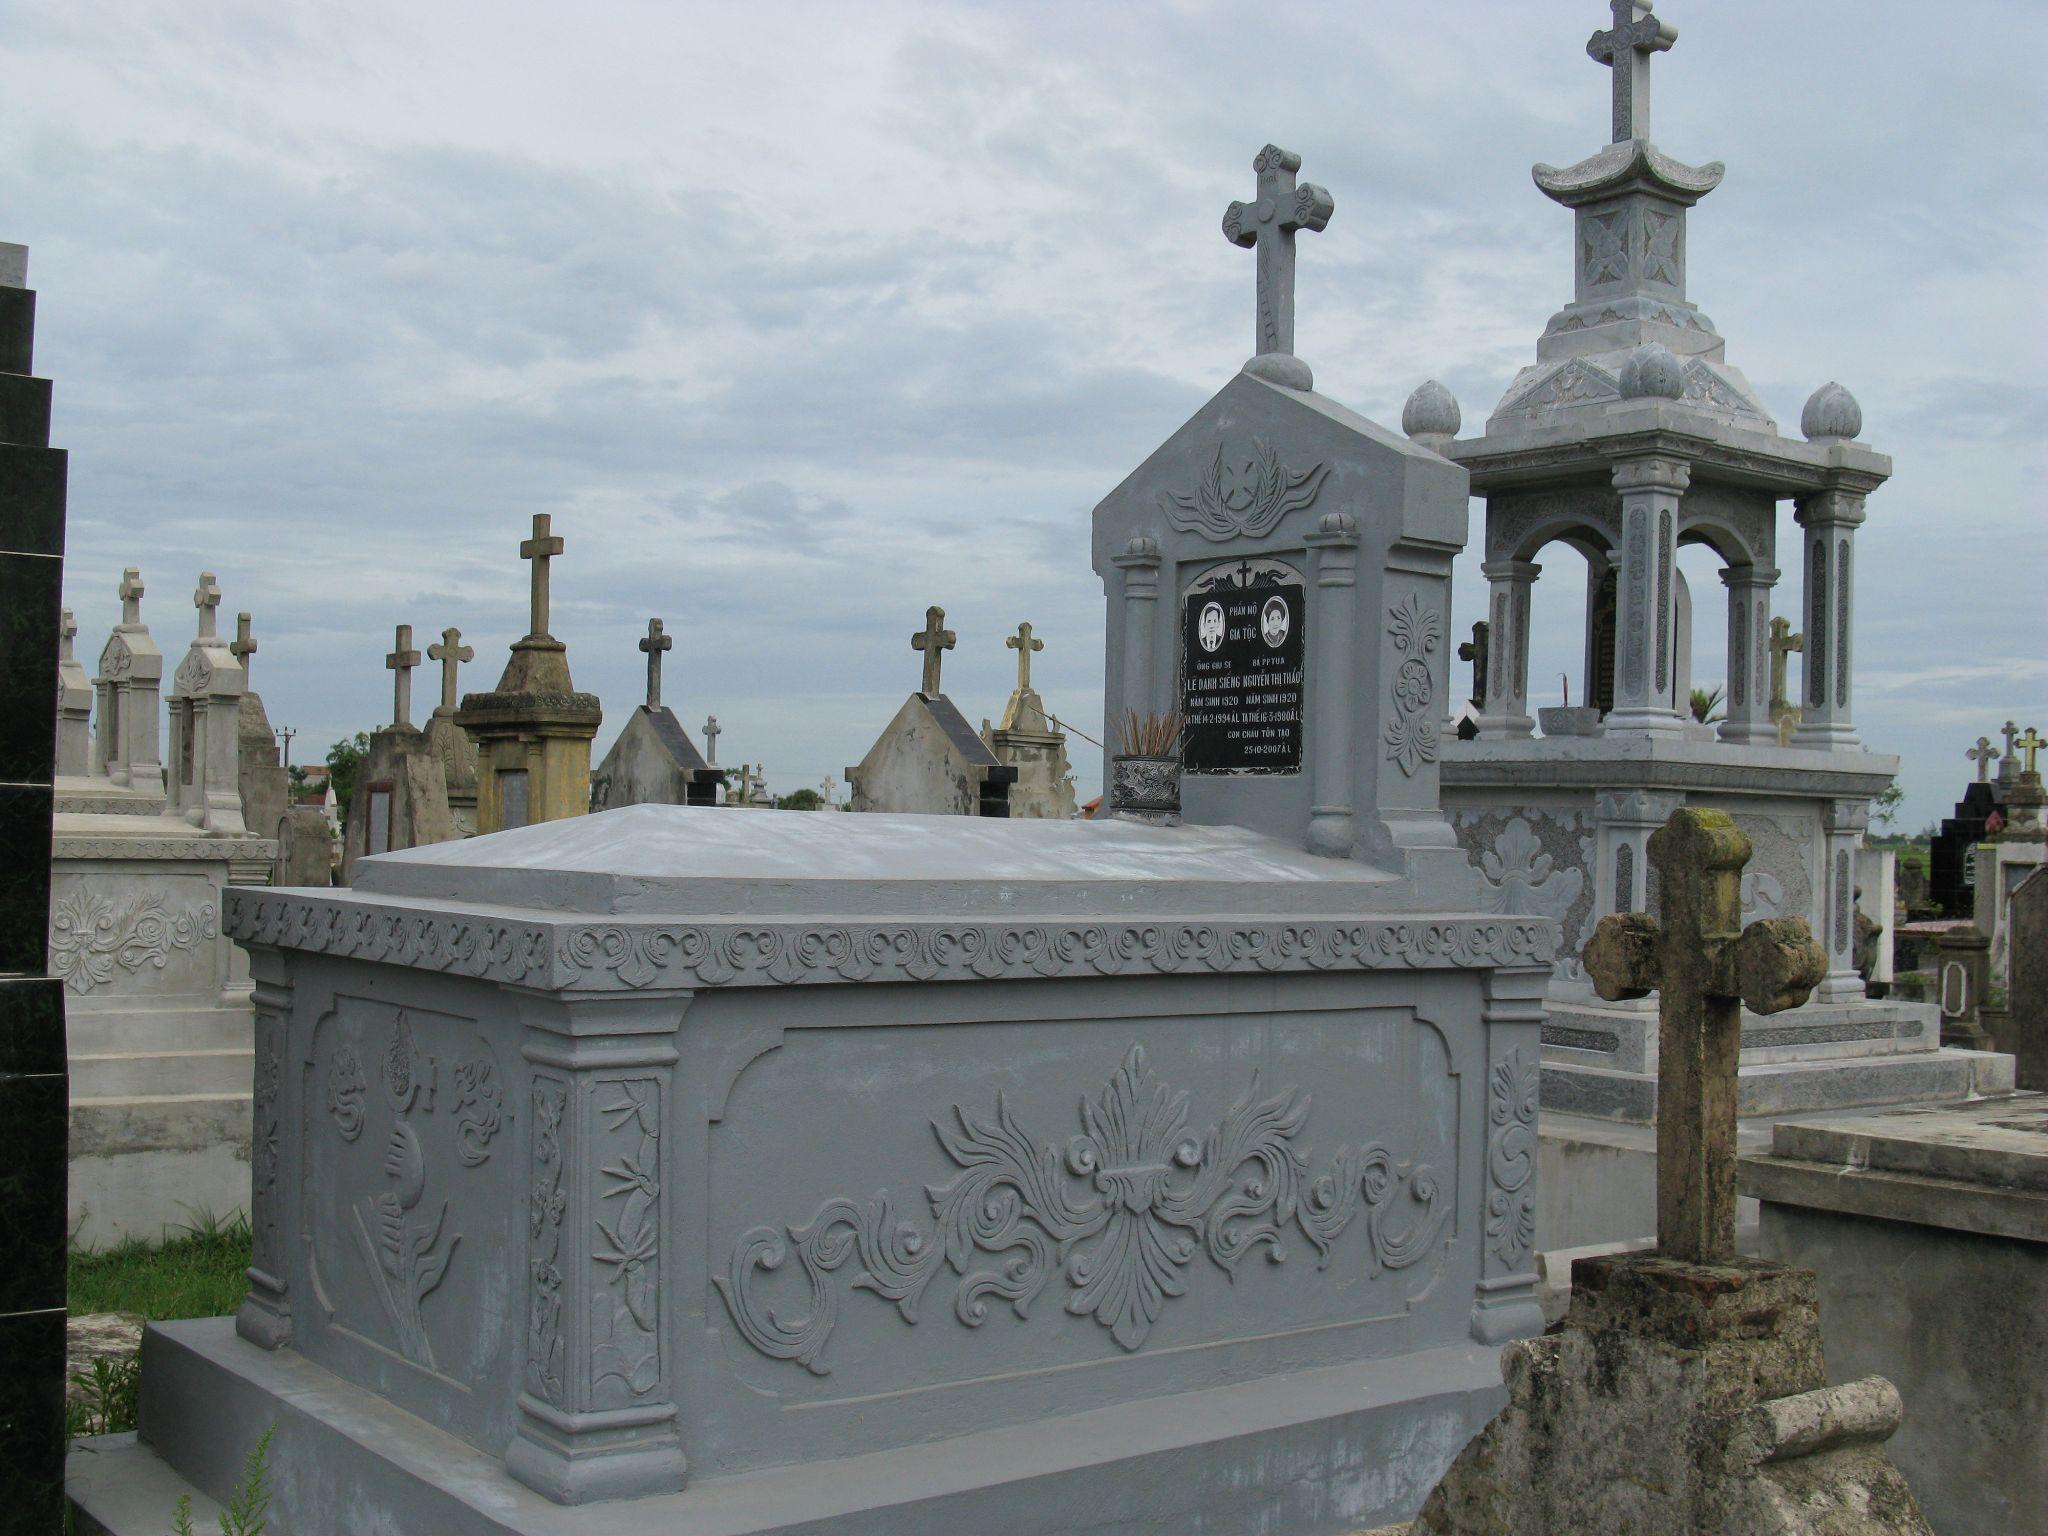 mộ công giao 11